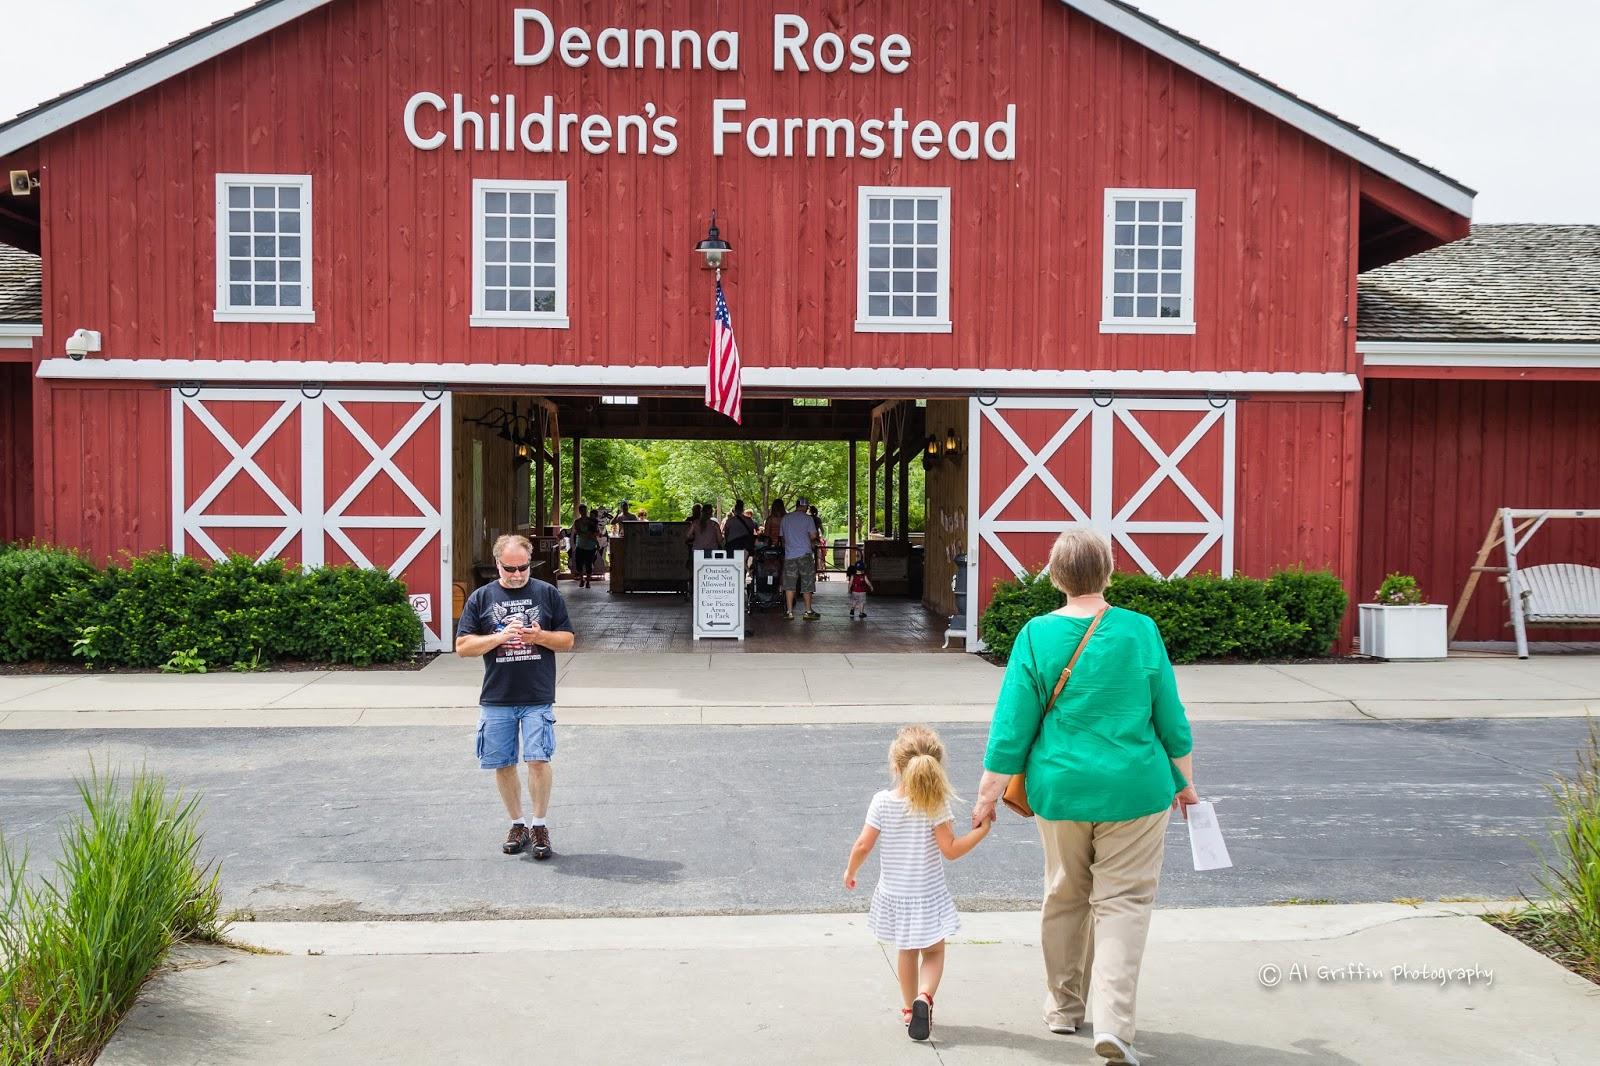 Deanna Rose Childrenu0027s Farmstead